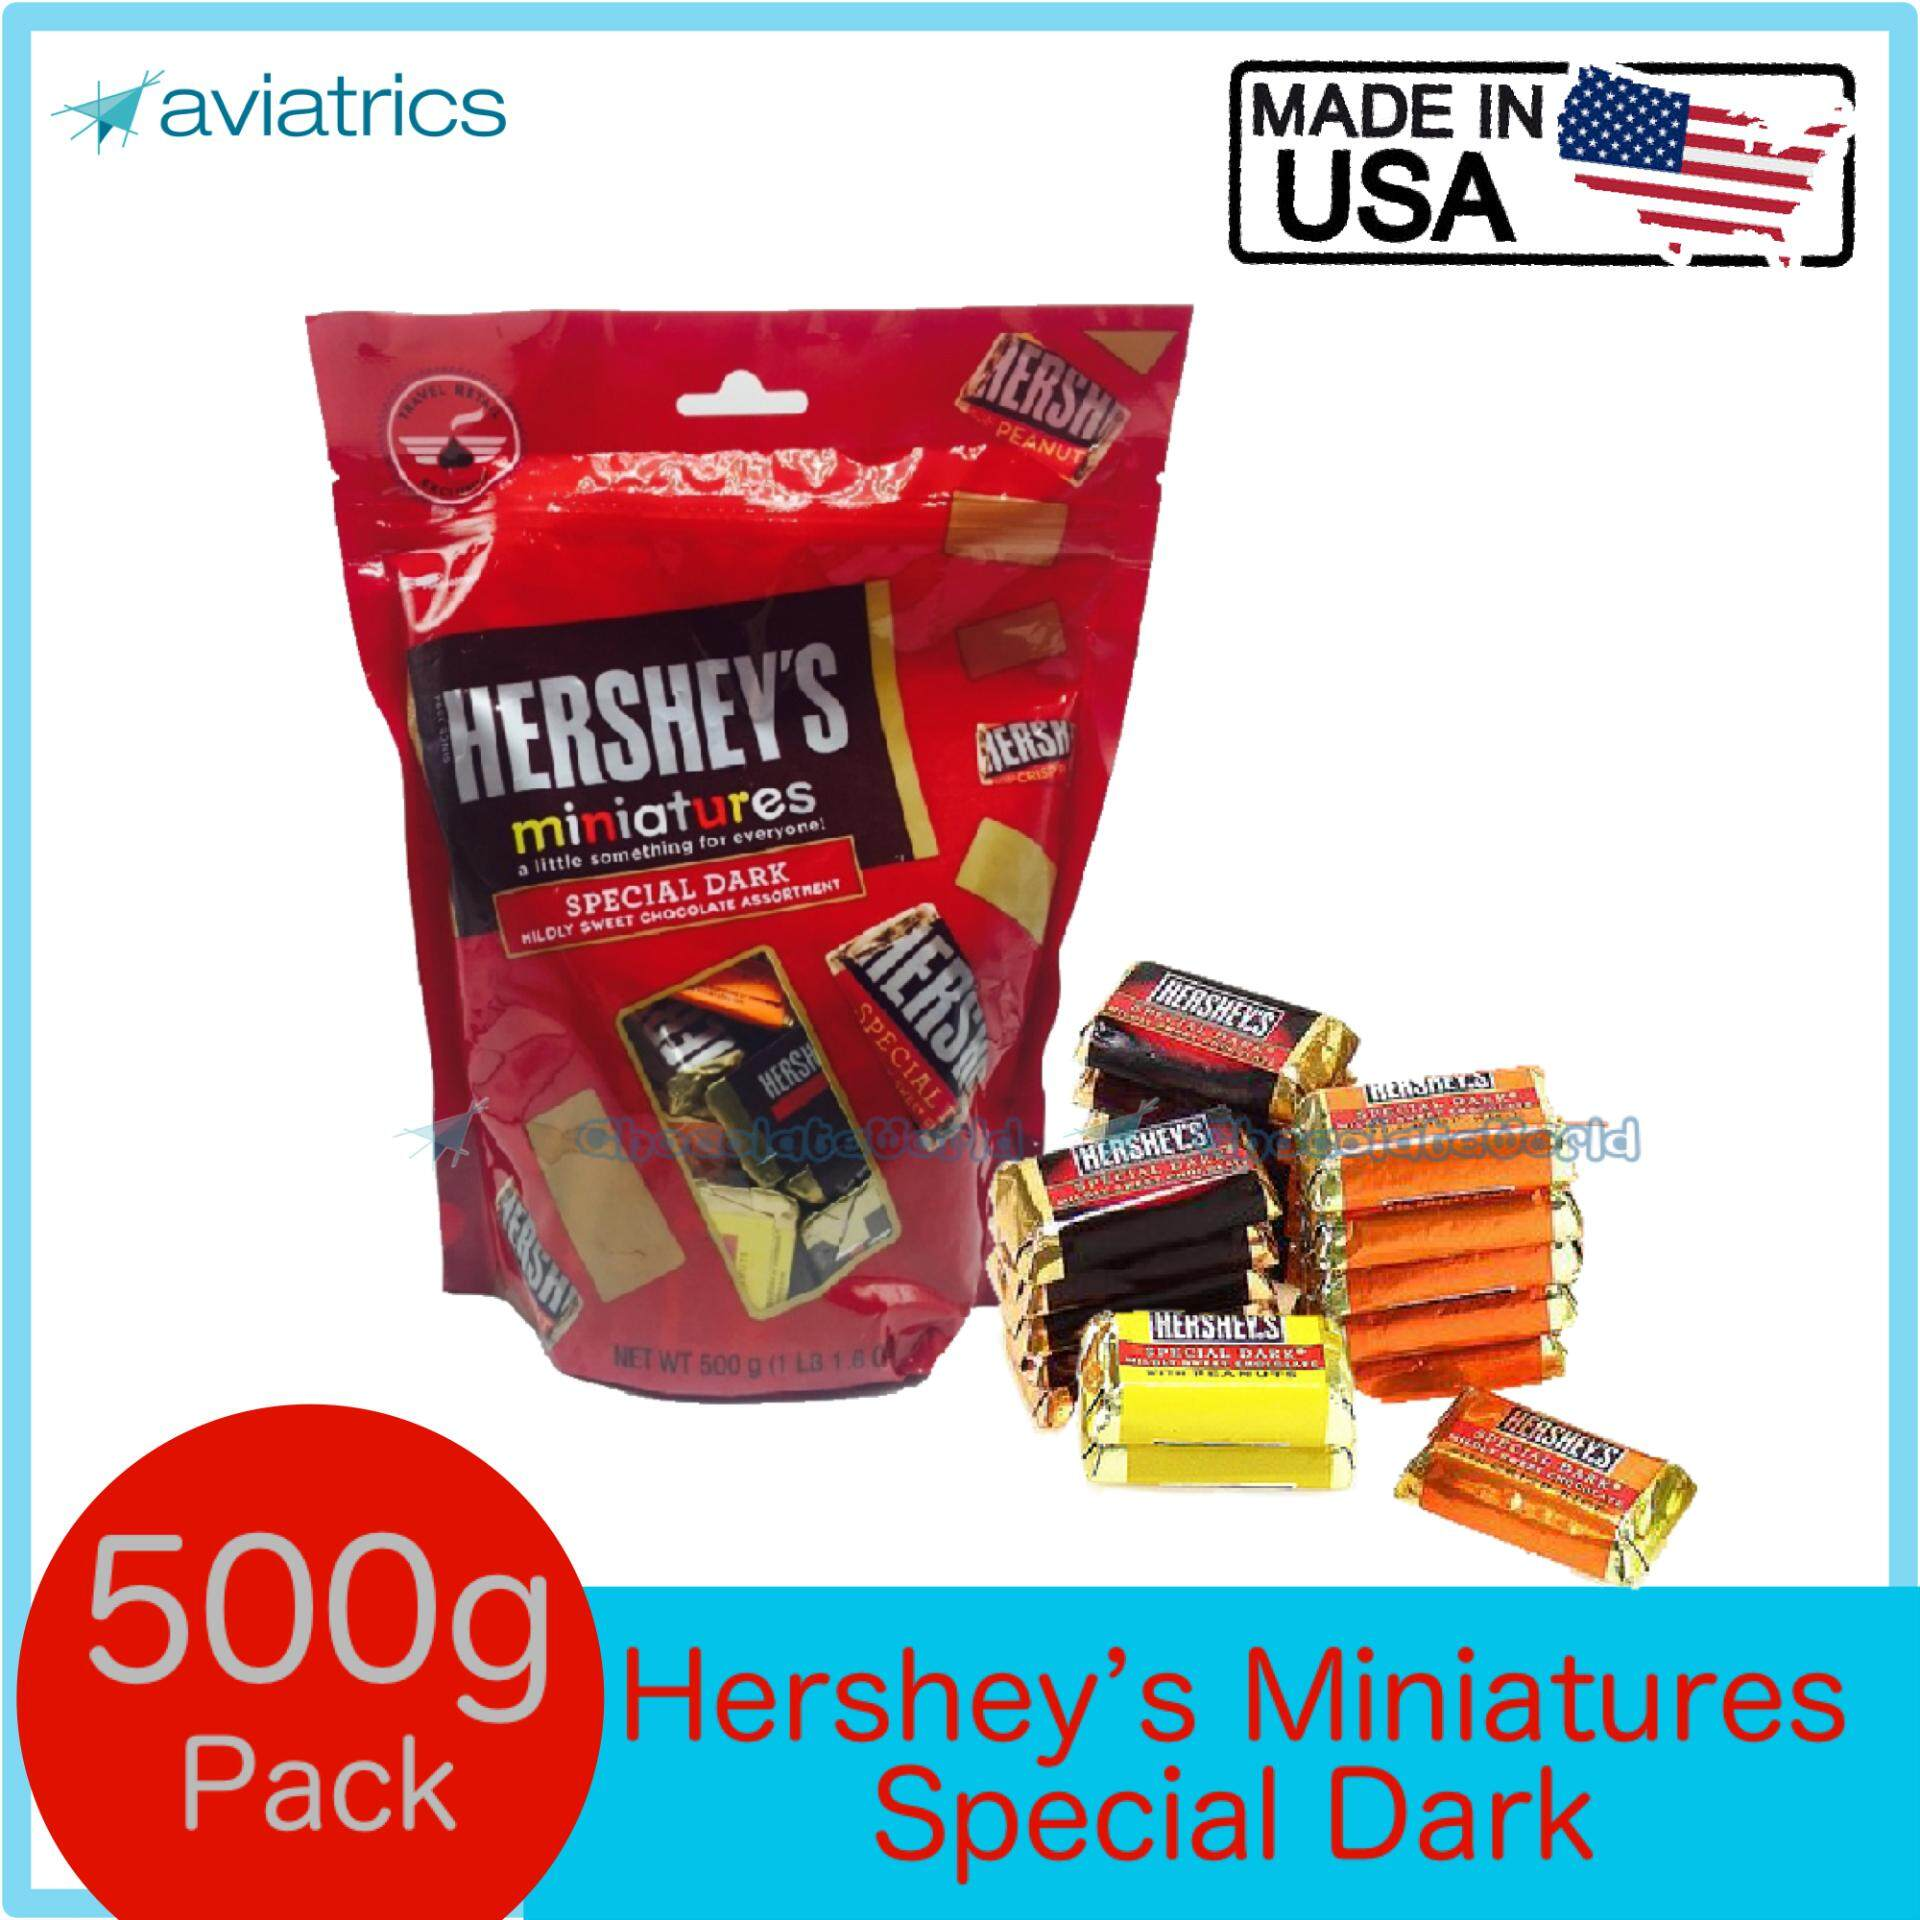 Hershey's Miniatures Special Dark Jumbo 500g (Made in USA)